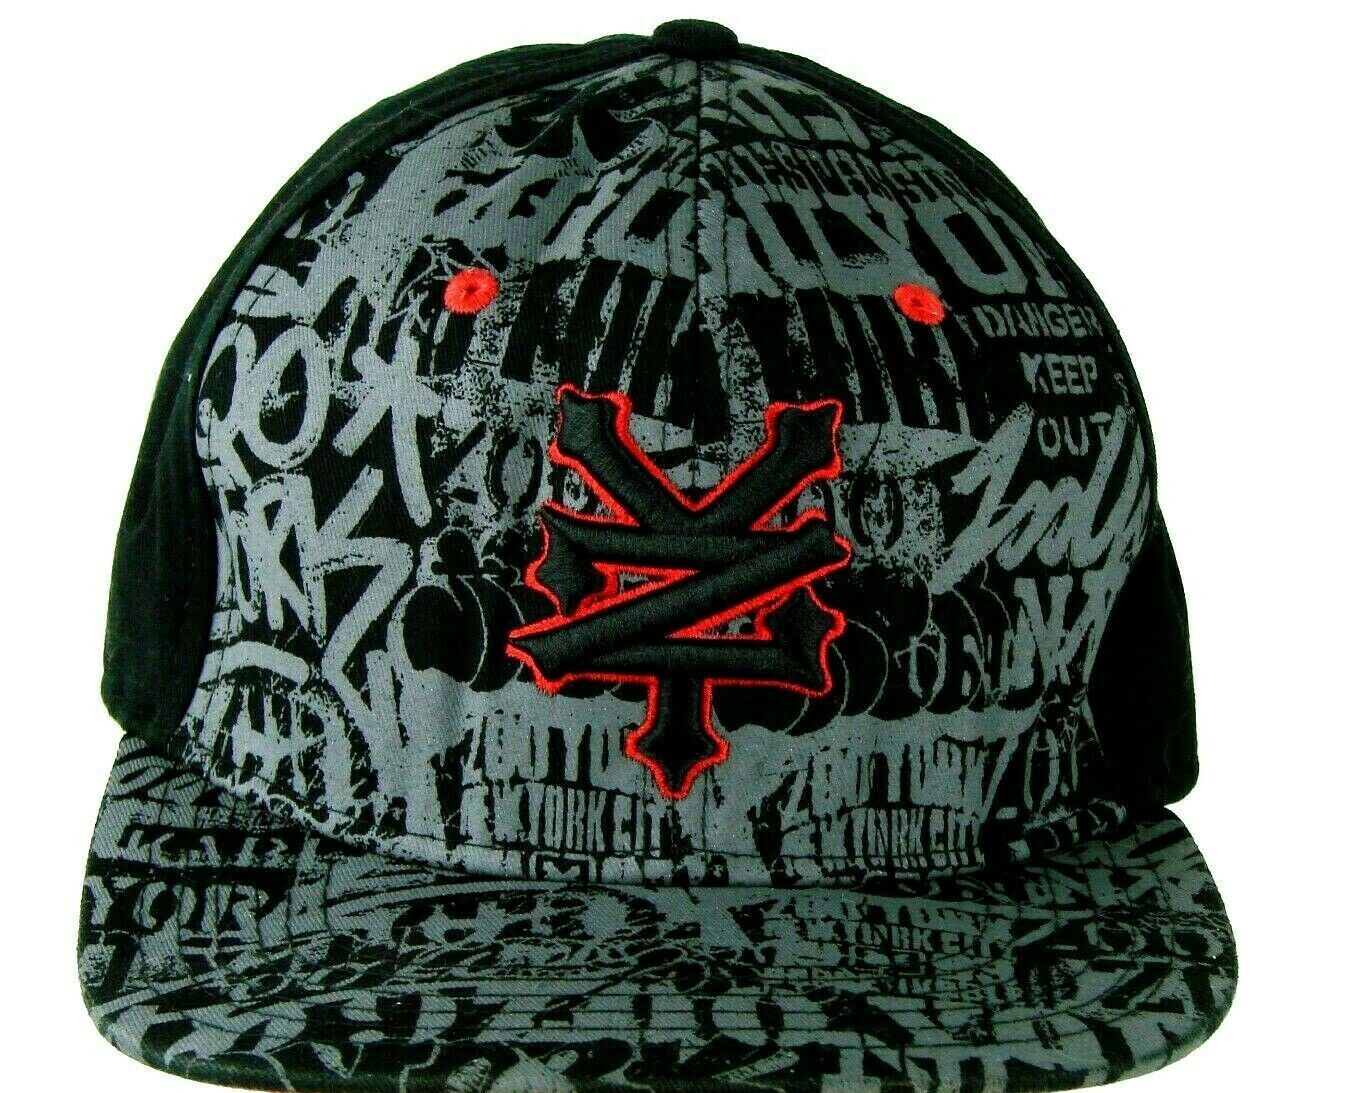 ZOO York Mens Snapback Adjustable Cap Hat Black Gray Graphic Cotton - $19.97